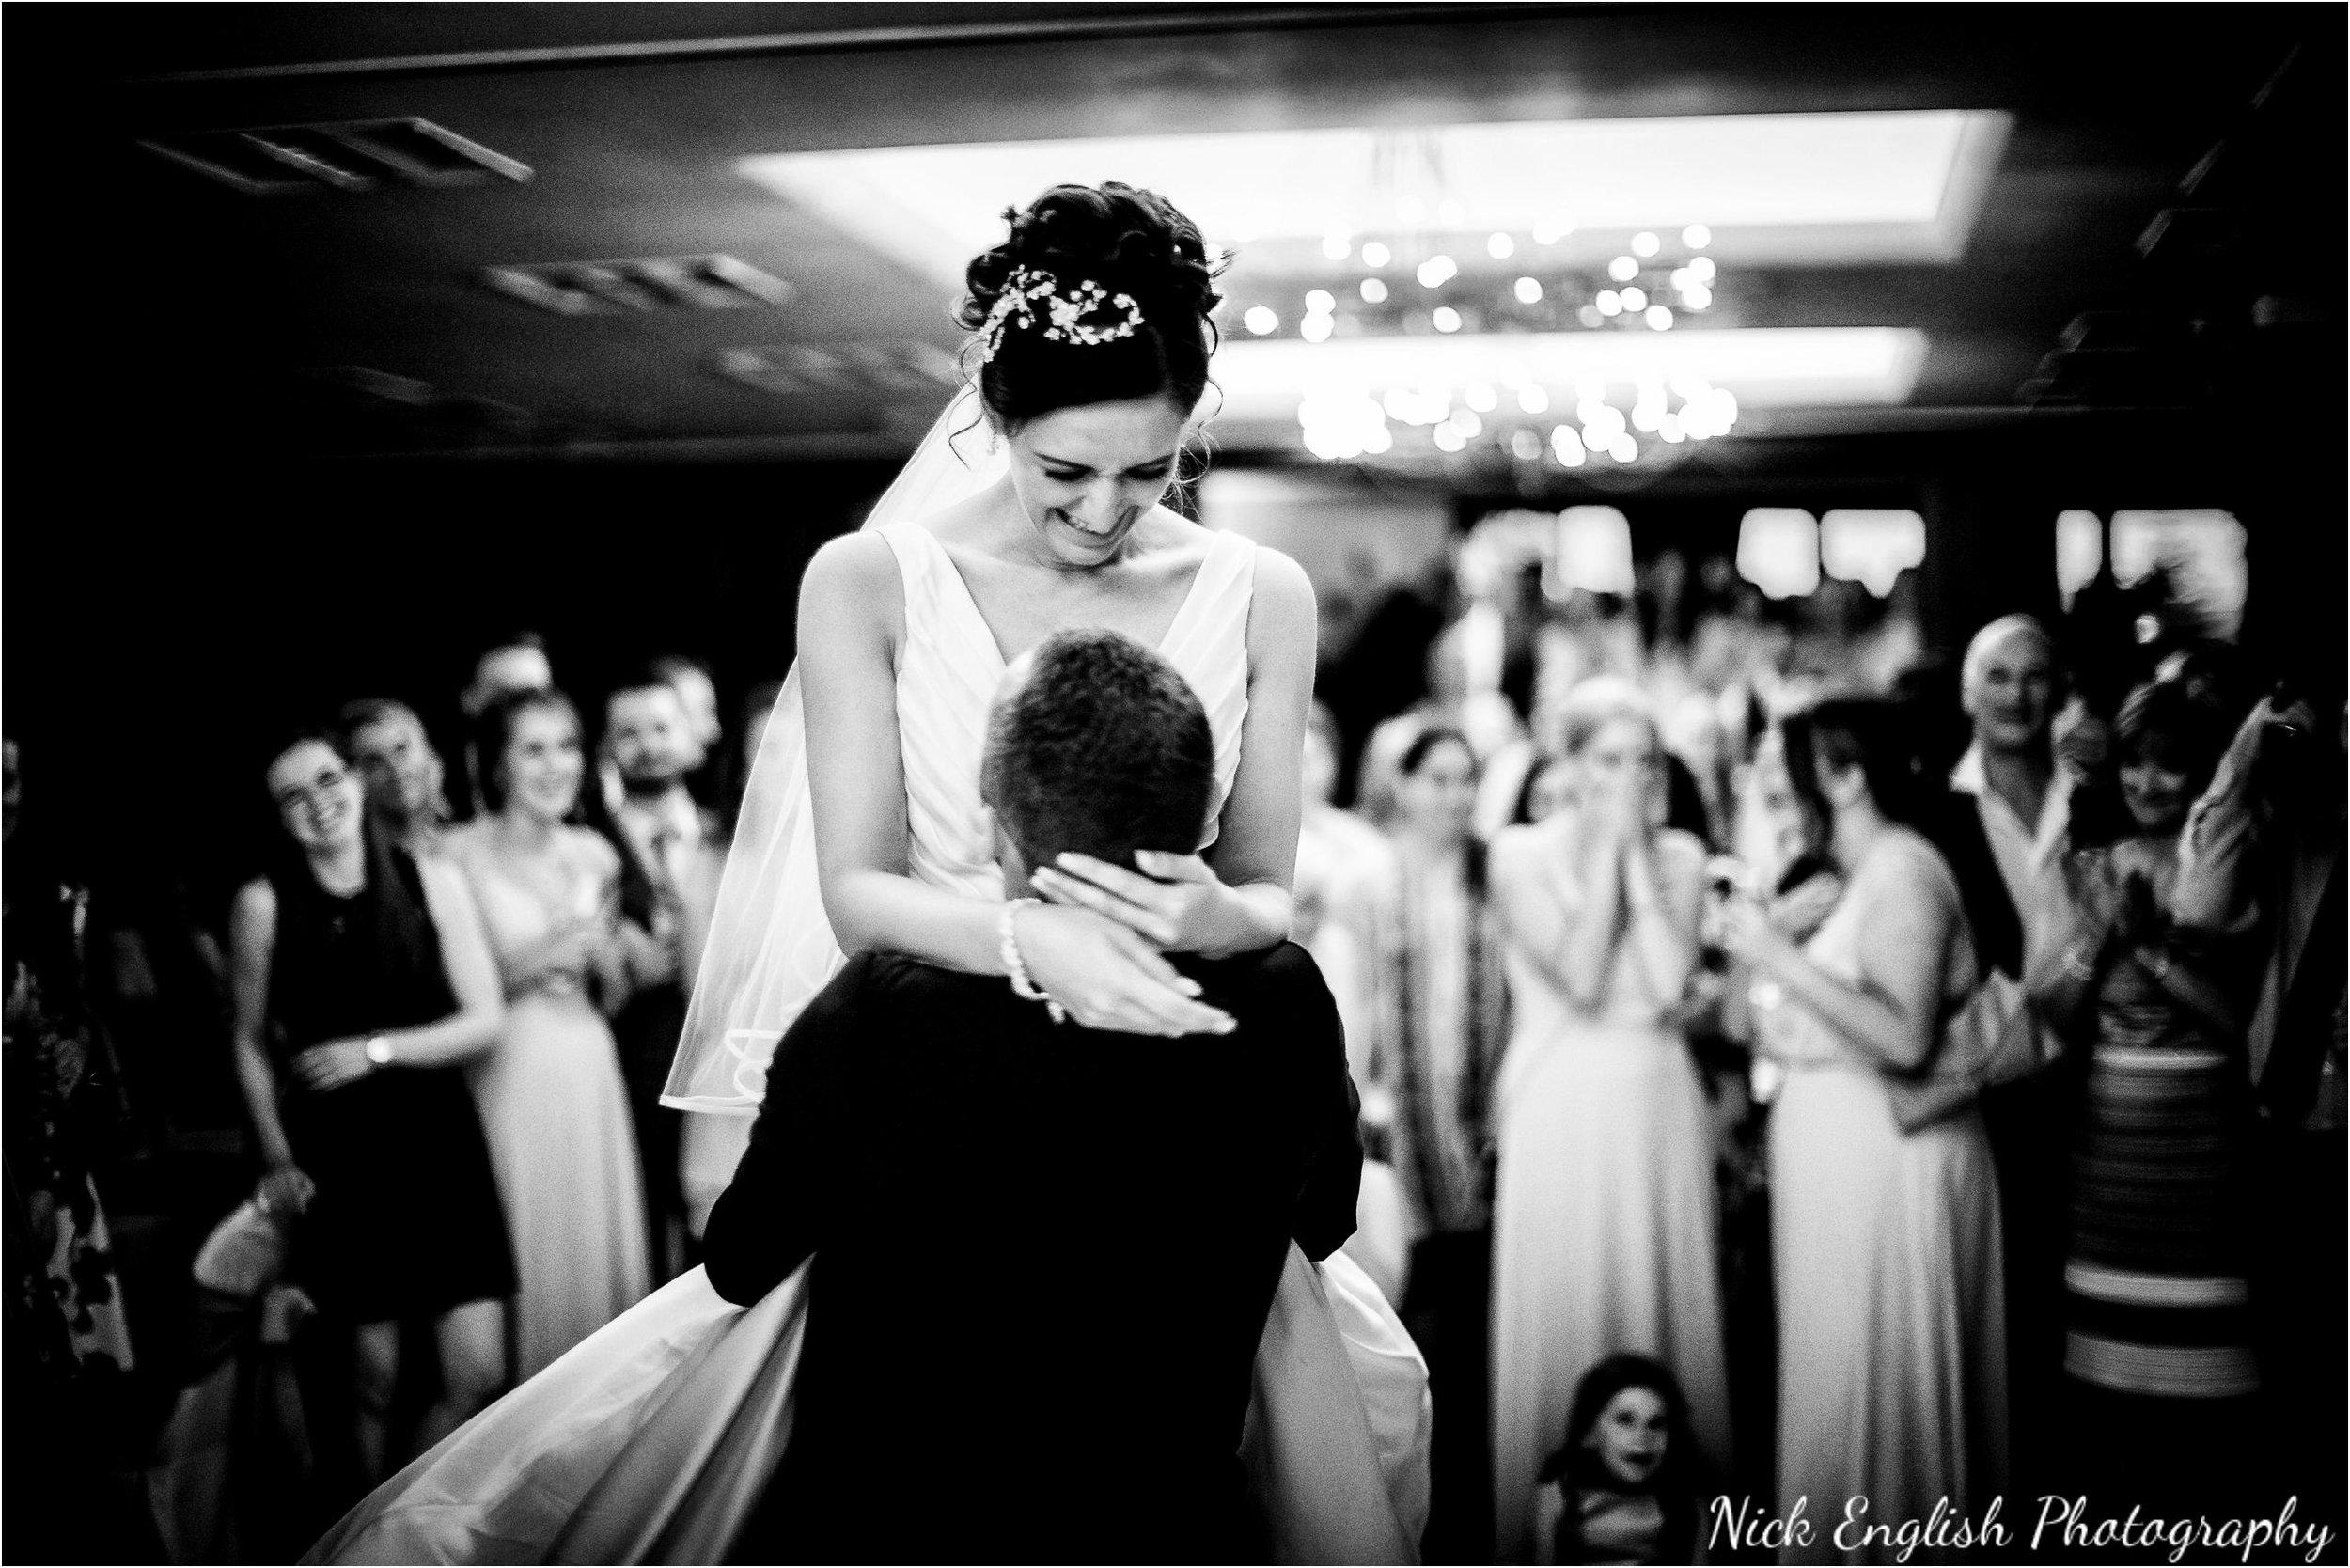 Emily David Wedding Photographs at Barton Grange Preston by Nick English Photography 225jpg.jpeg